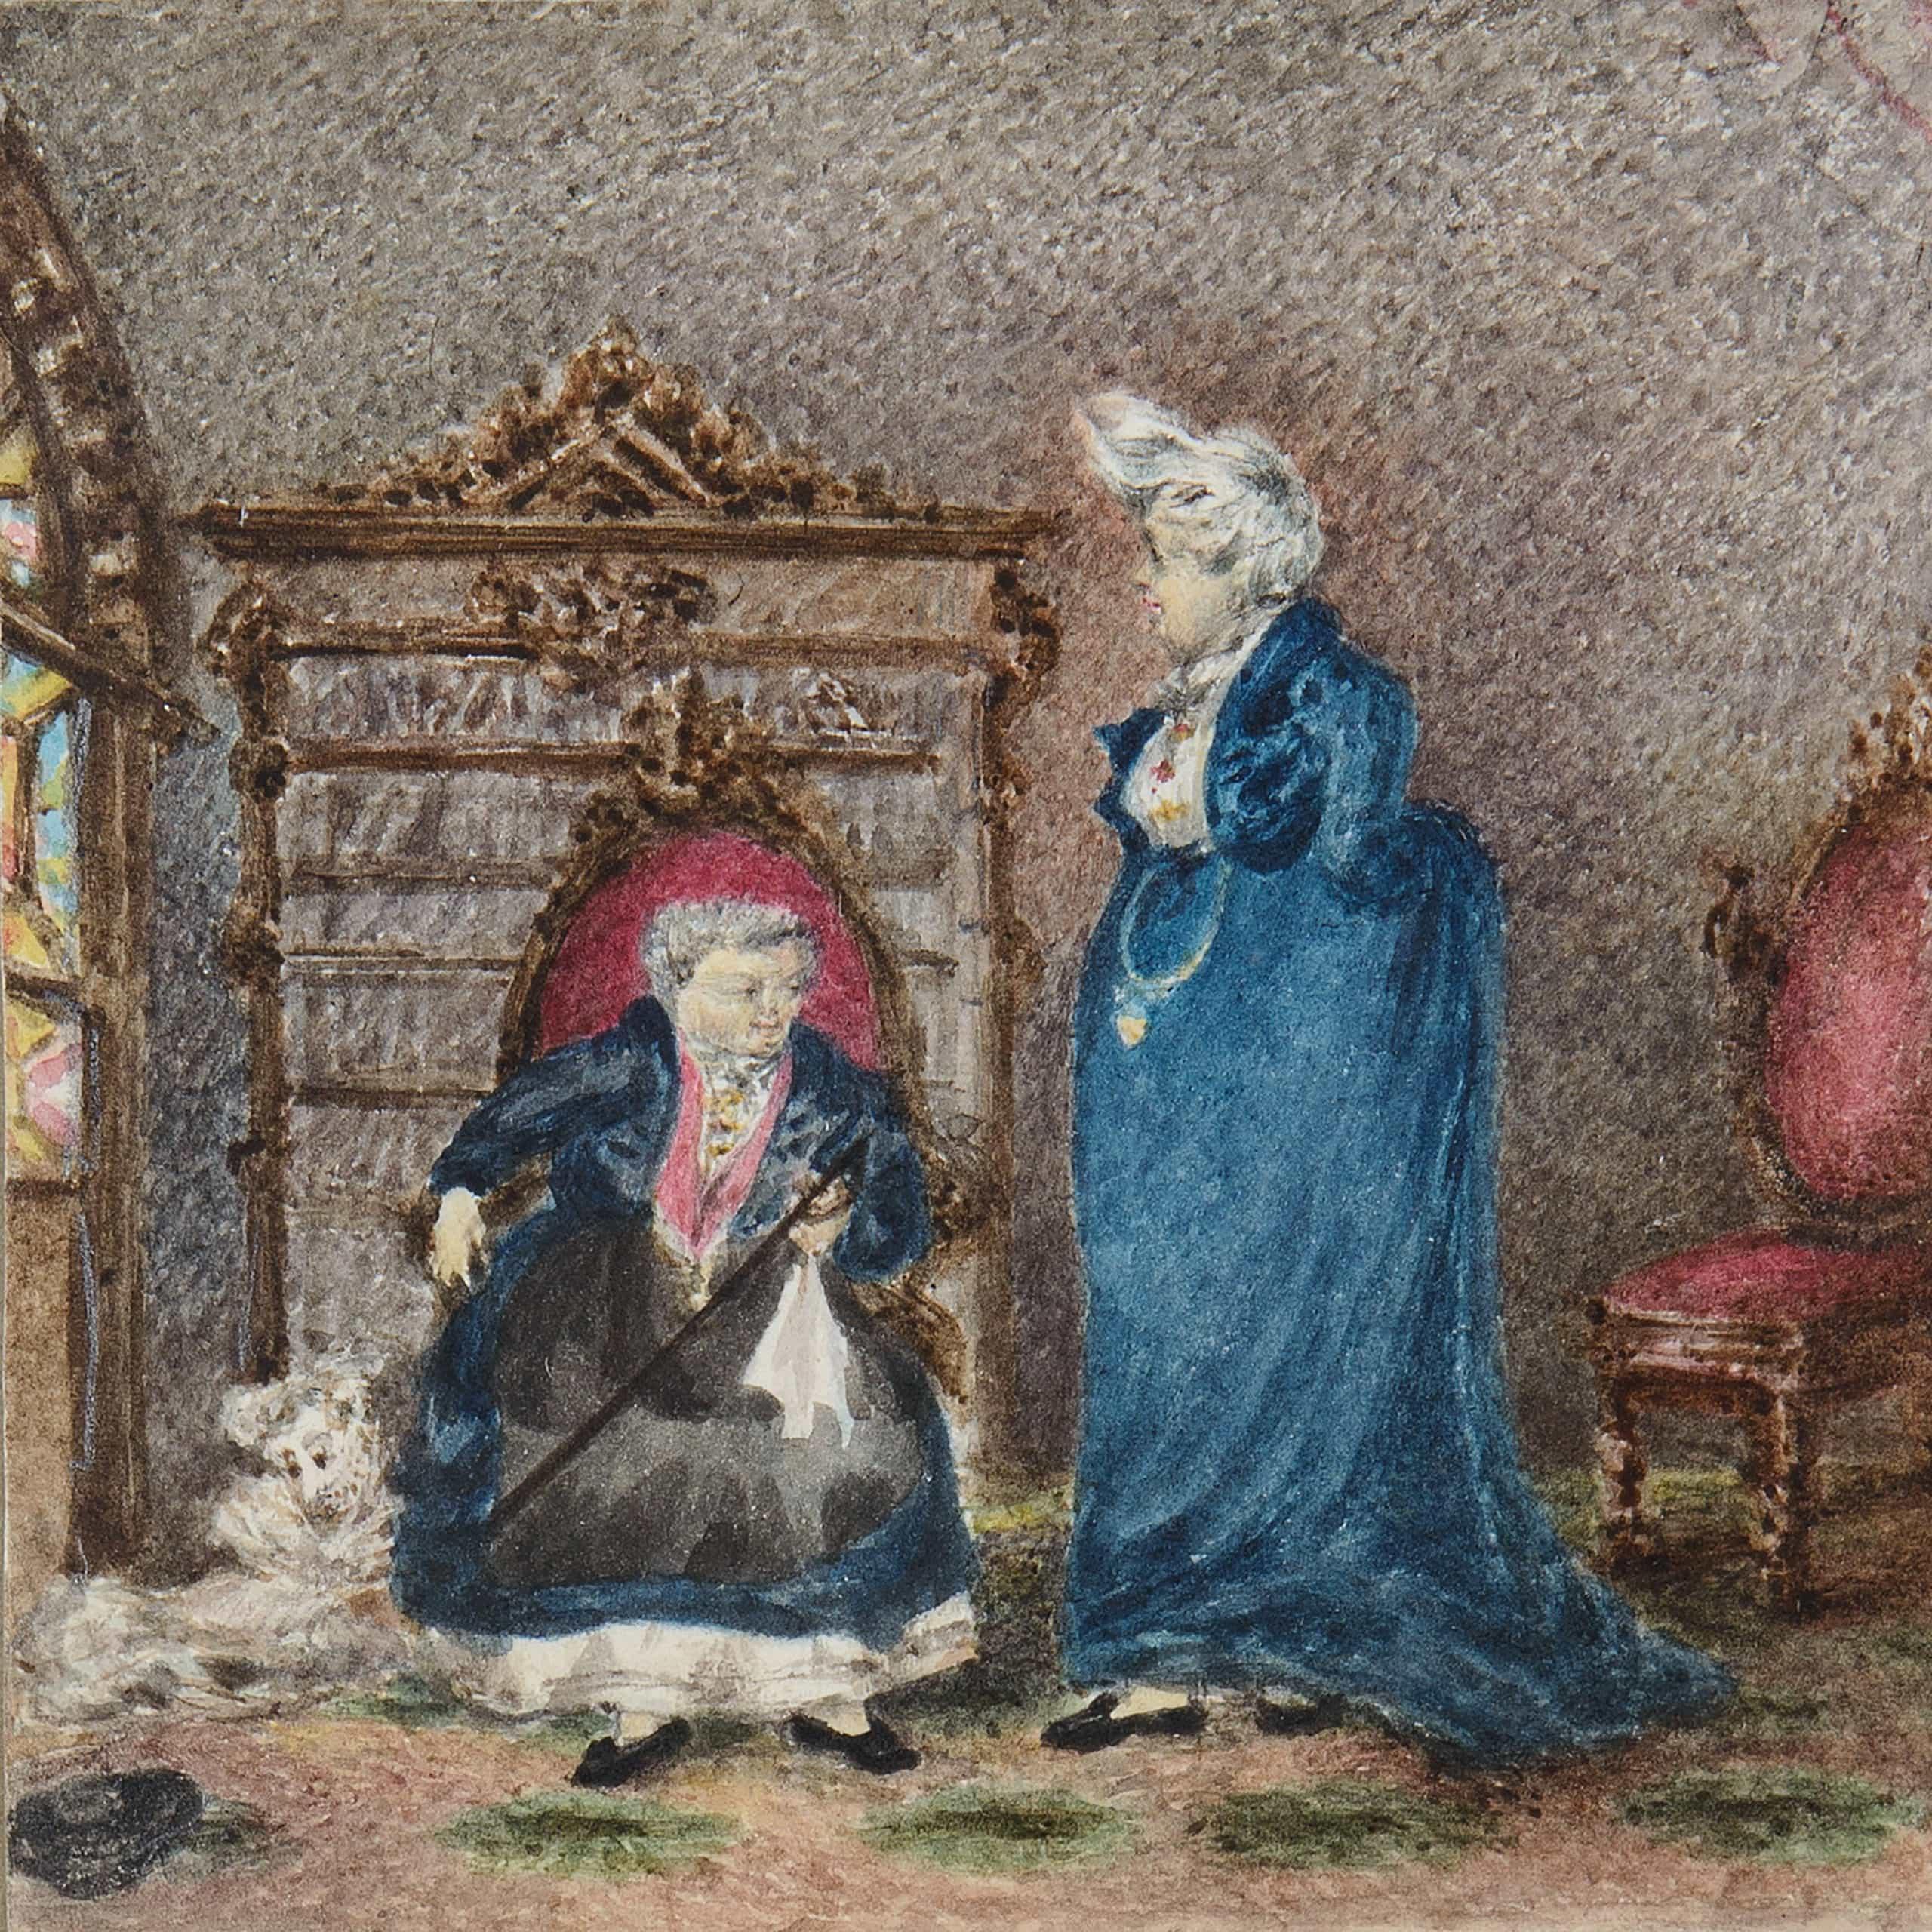 The Ladies of Llangollen at Plas Newydd - London Art Week